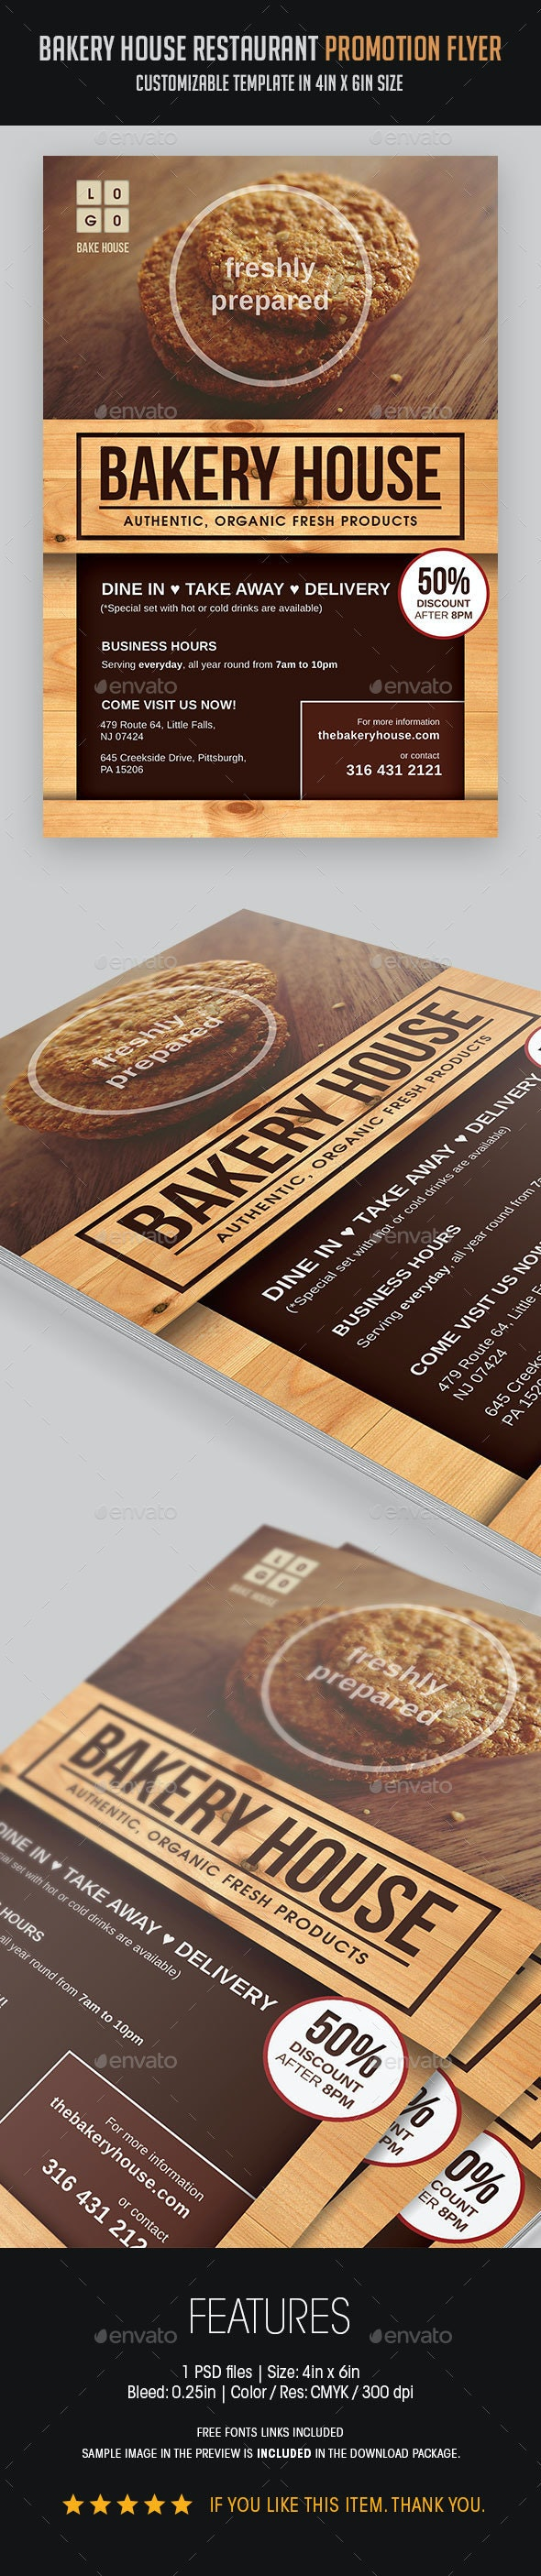 Bakery House Restaurant Promotion Flyer - Restaurant Flyers